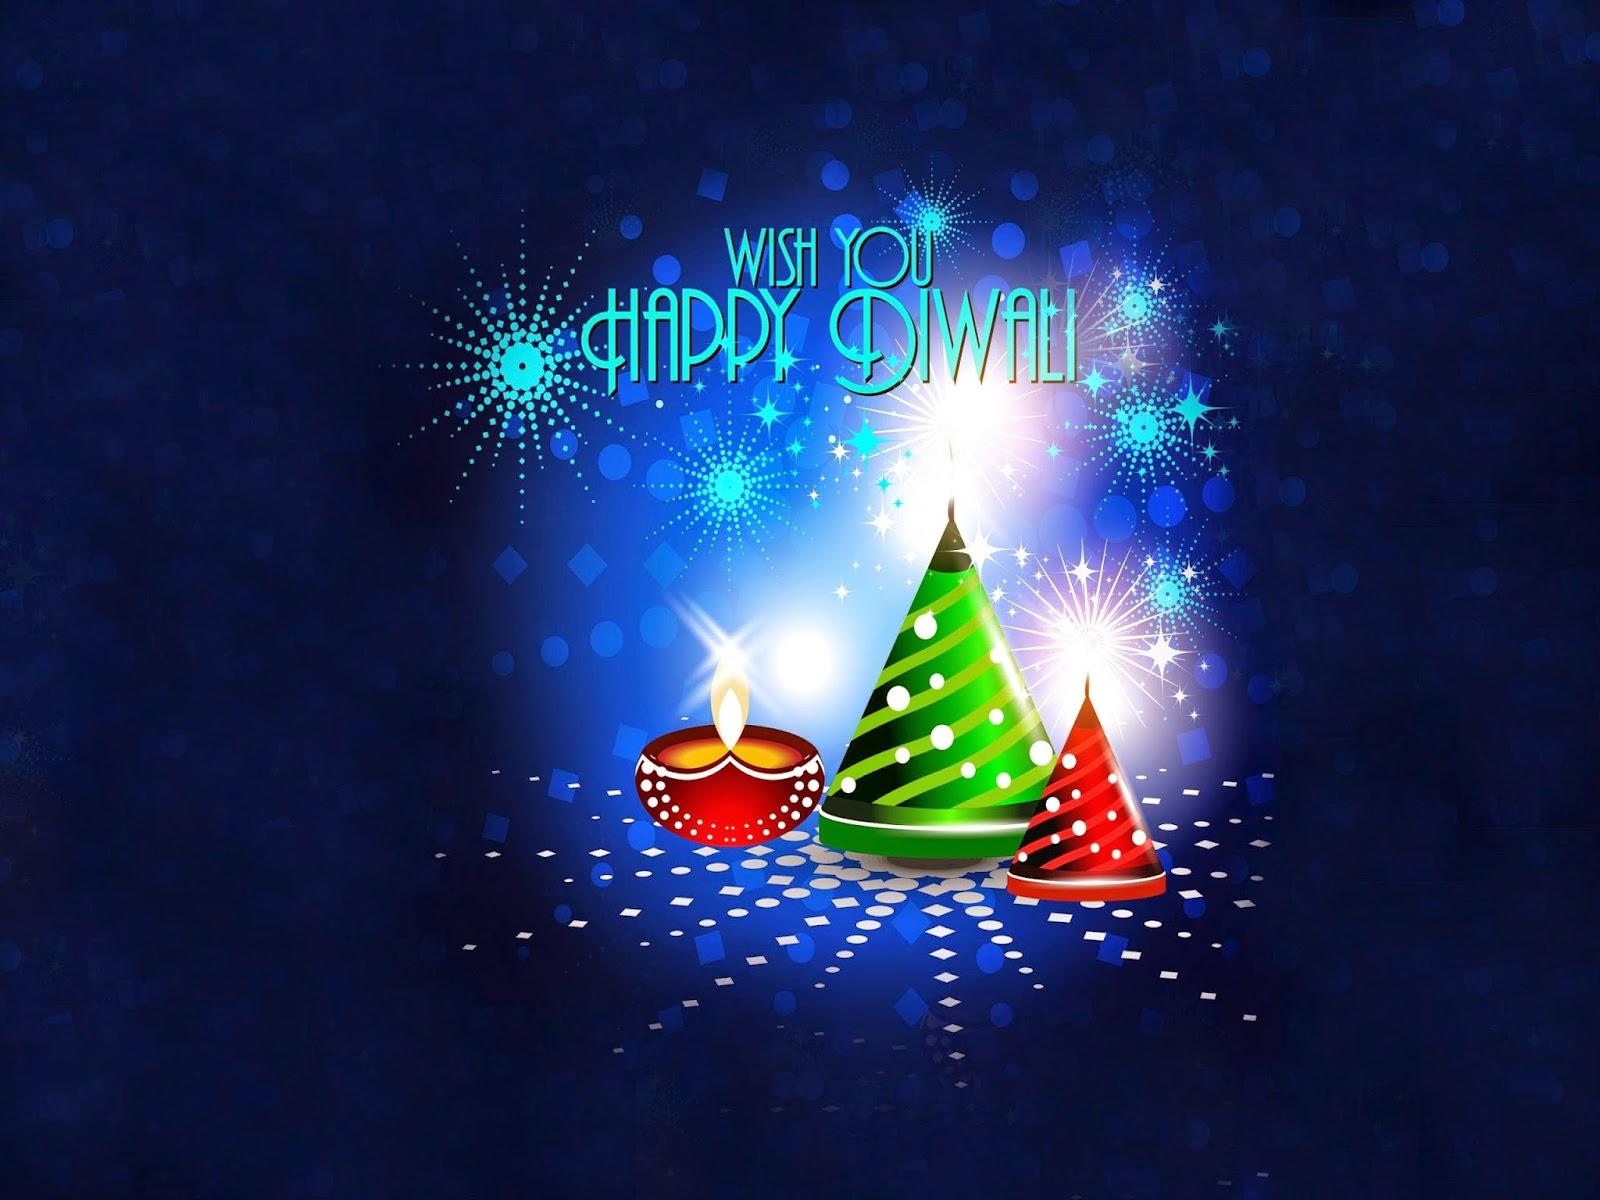 diwali fireworks image